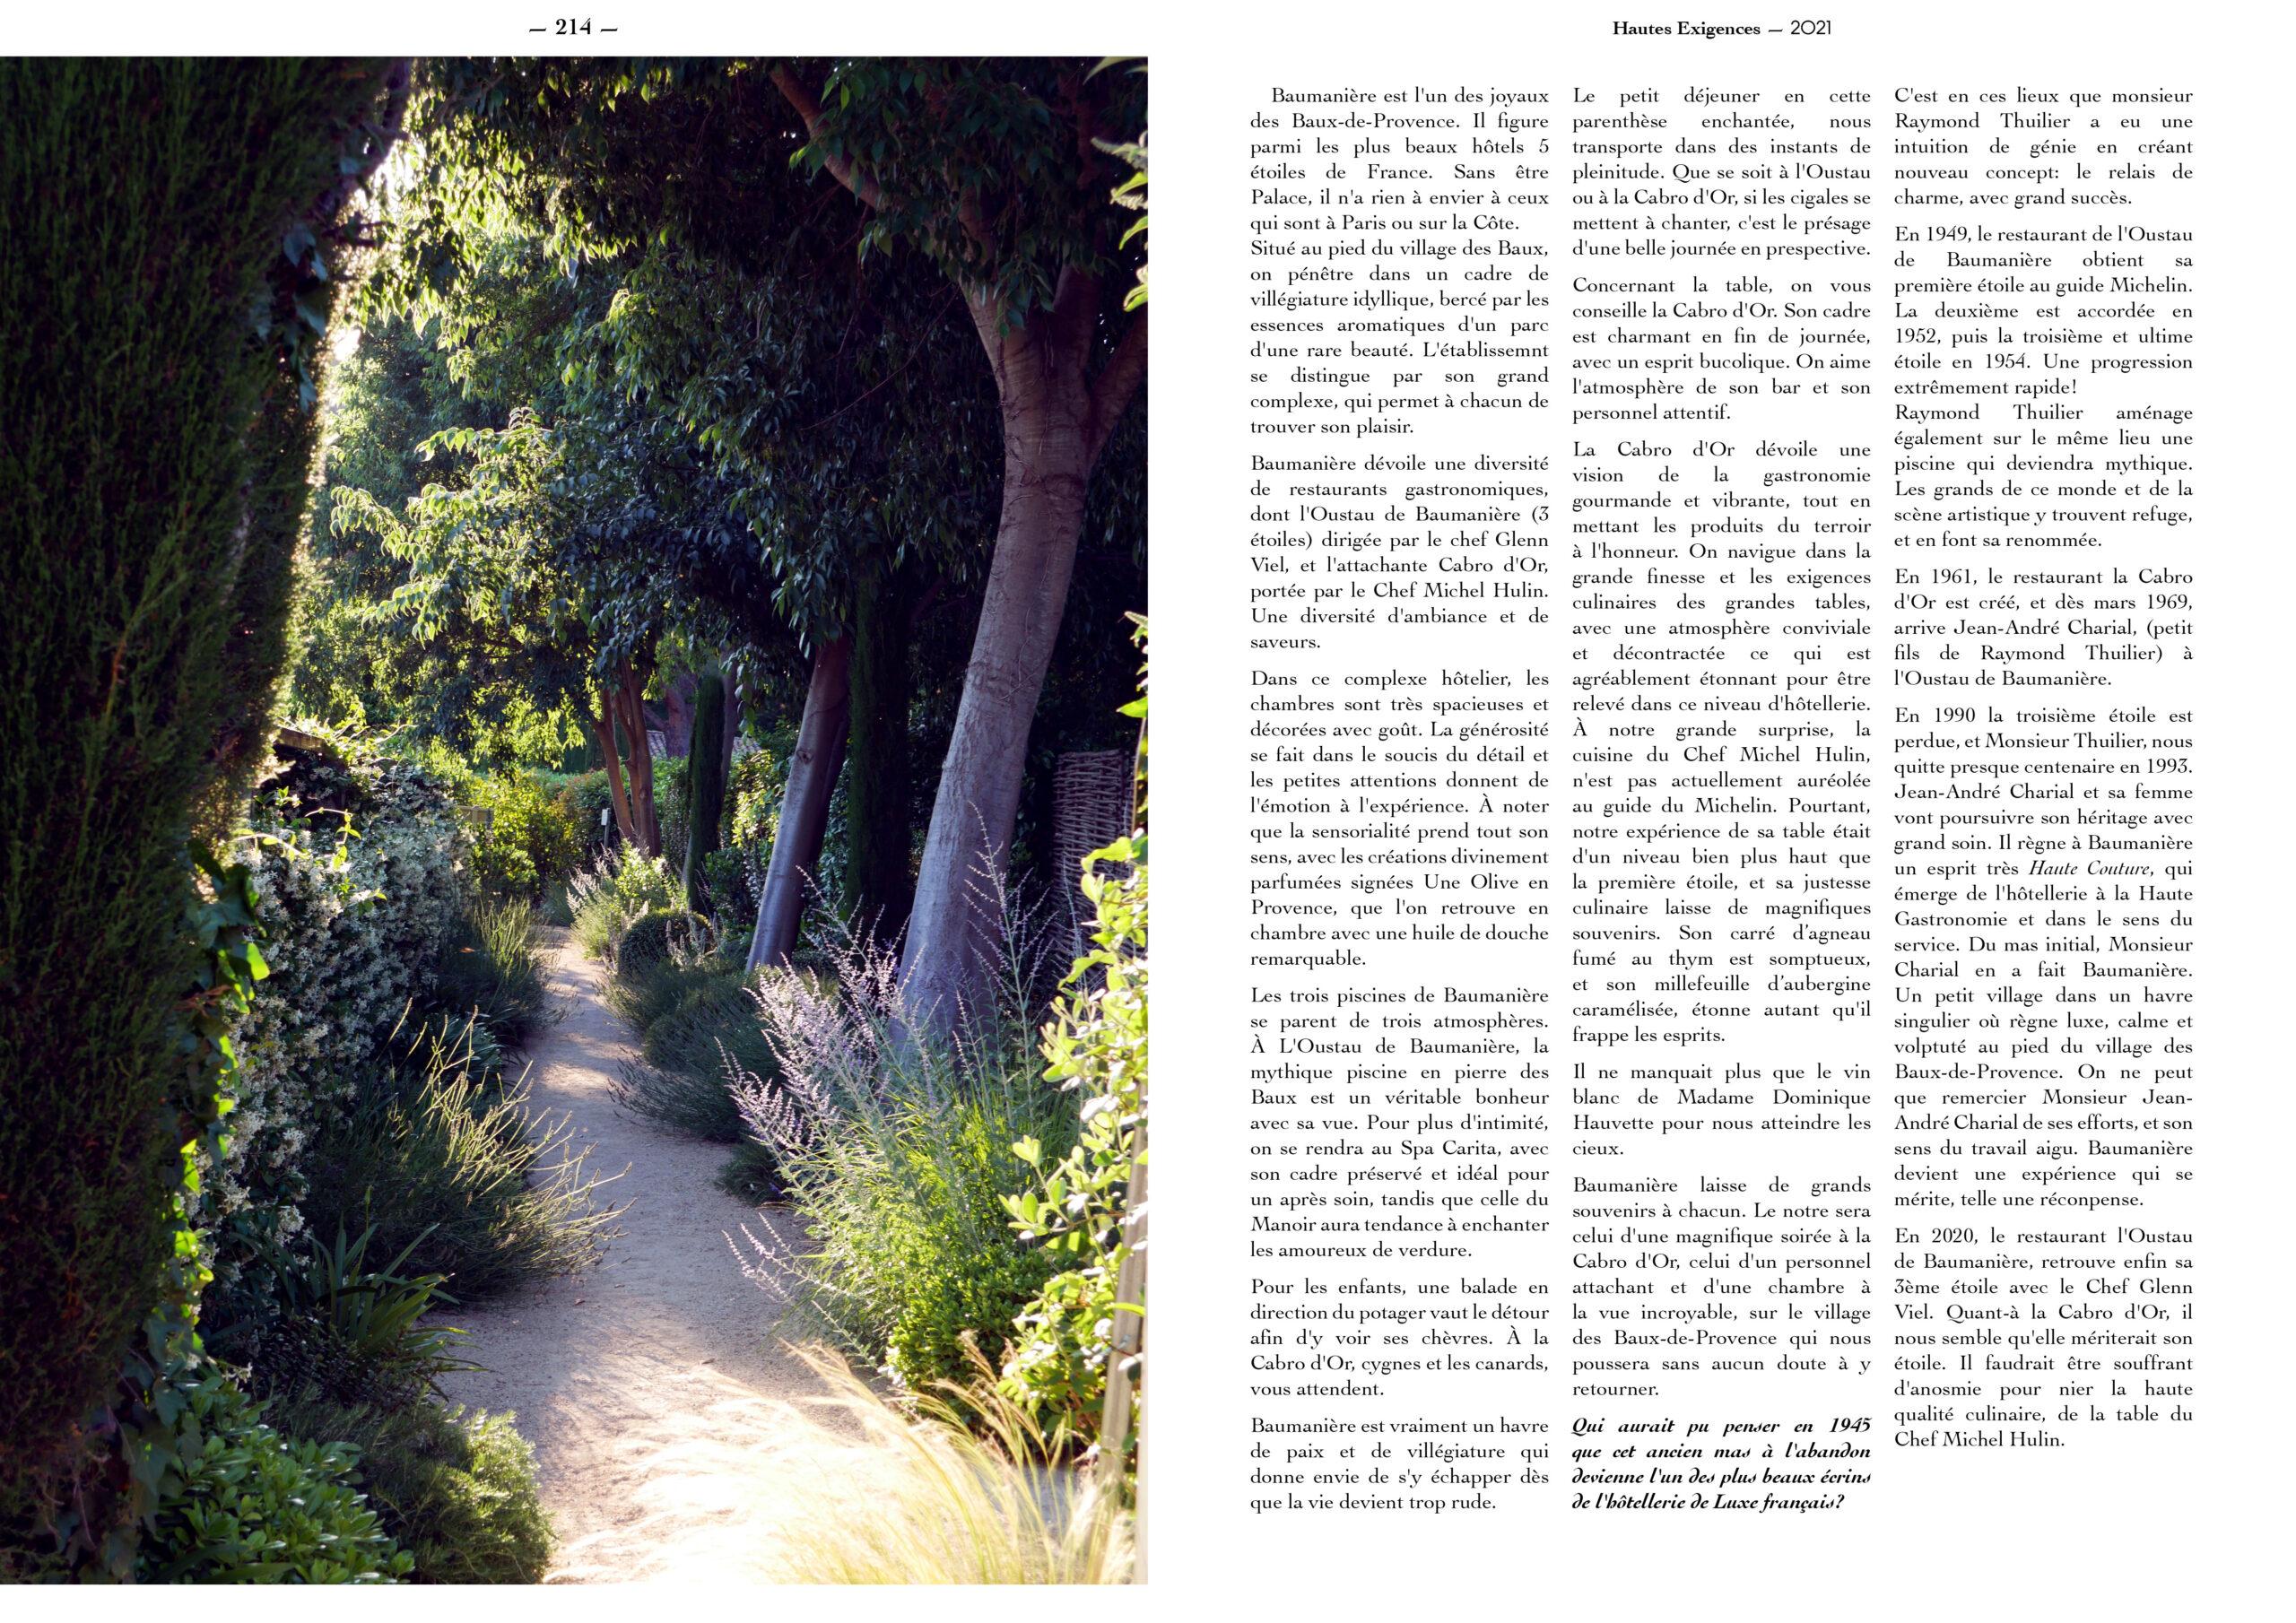 Hautes Exigences Magazine Hors Serie 2021 page 212-213